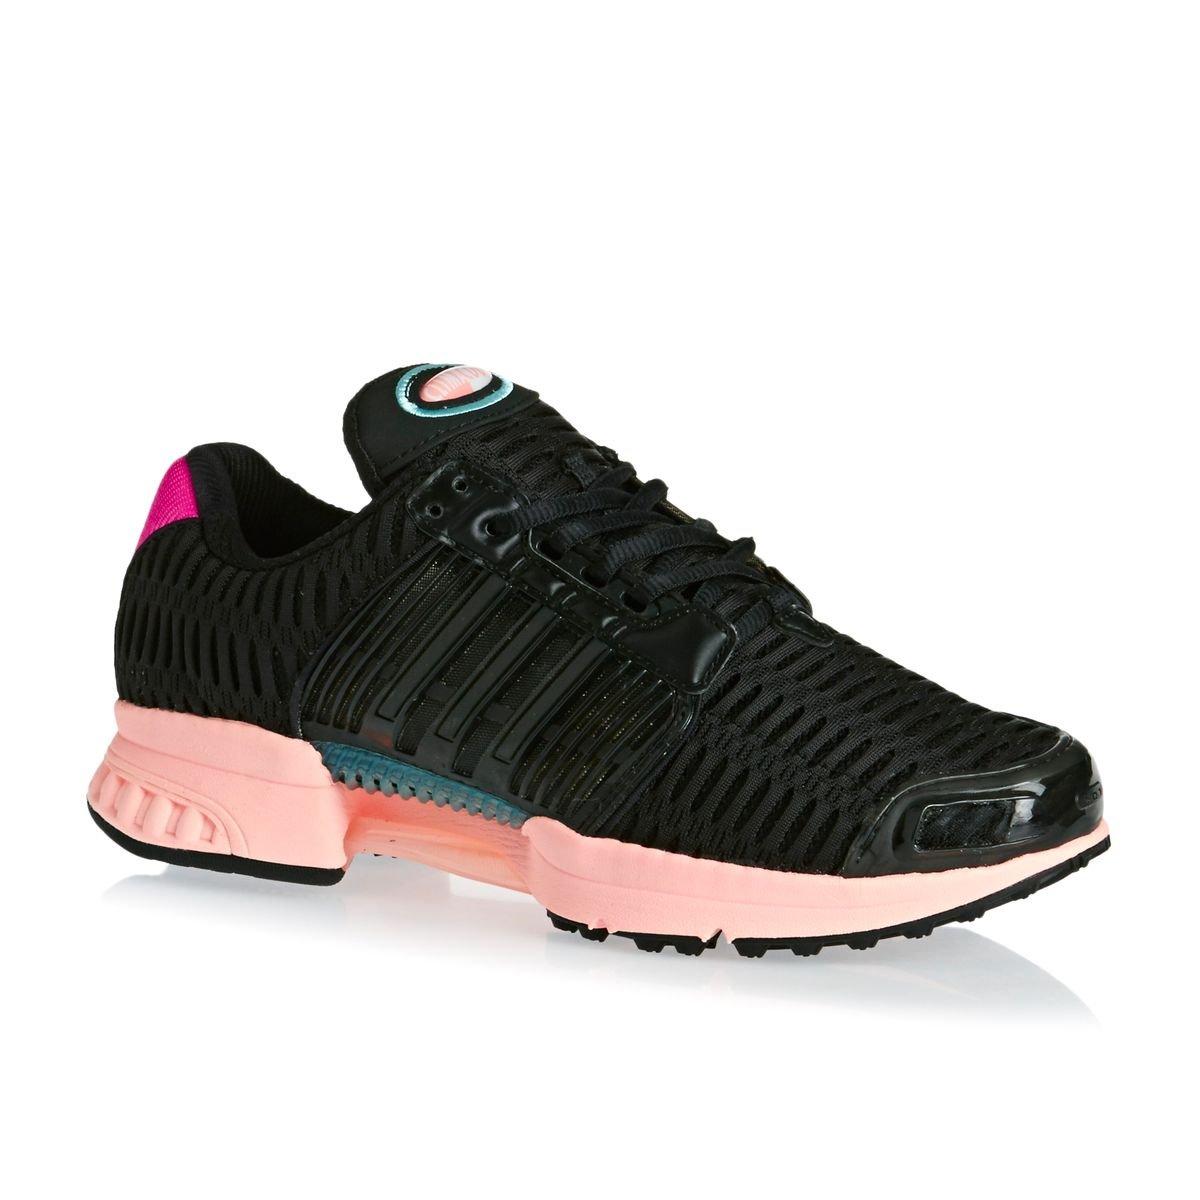 Adidas Climacool 02/17, Zapatillas de Deporte para Hombre 37 1/3 EU Negro